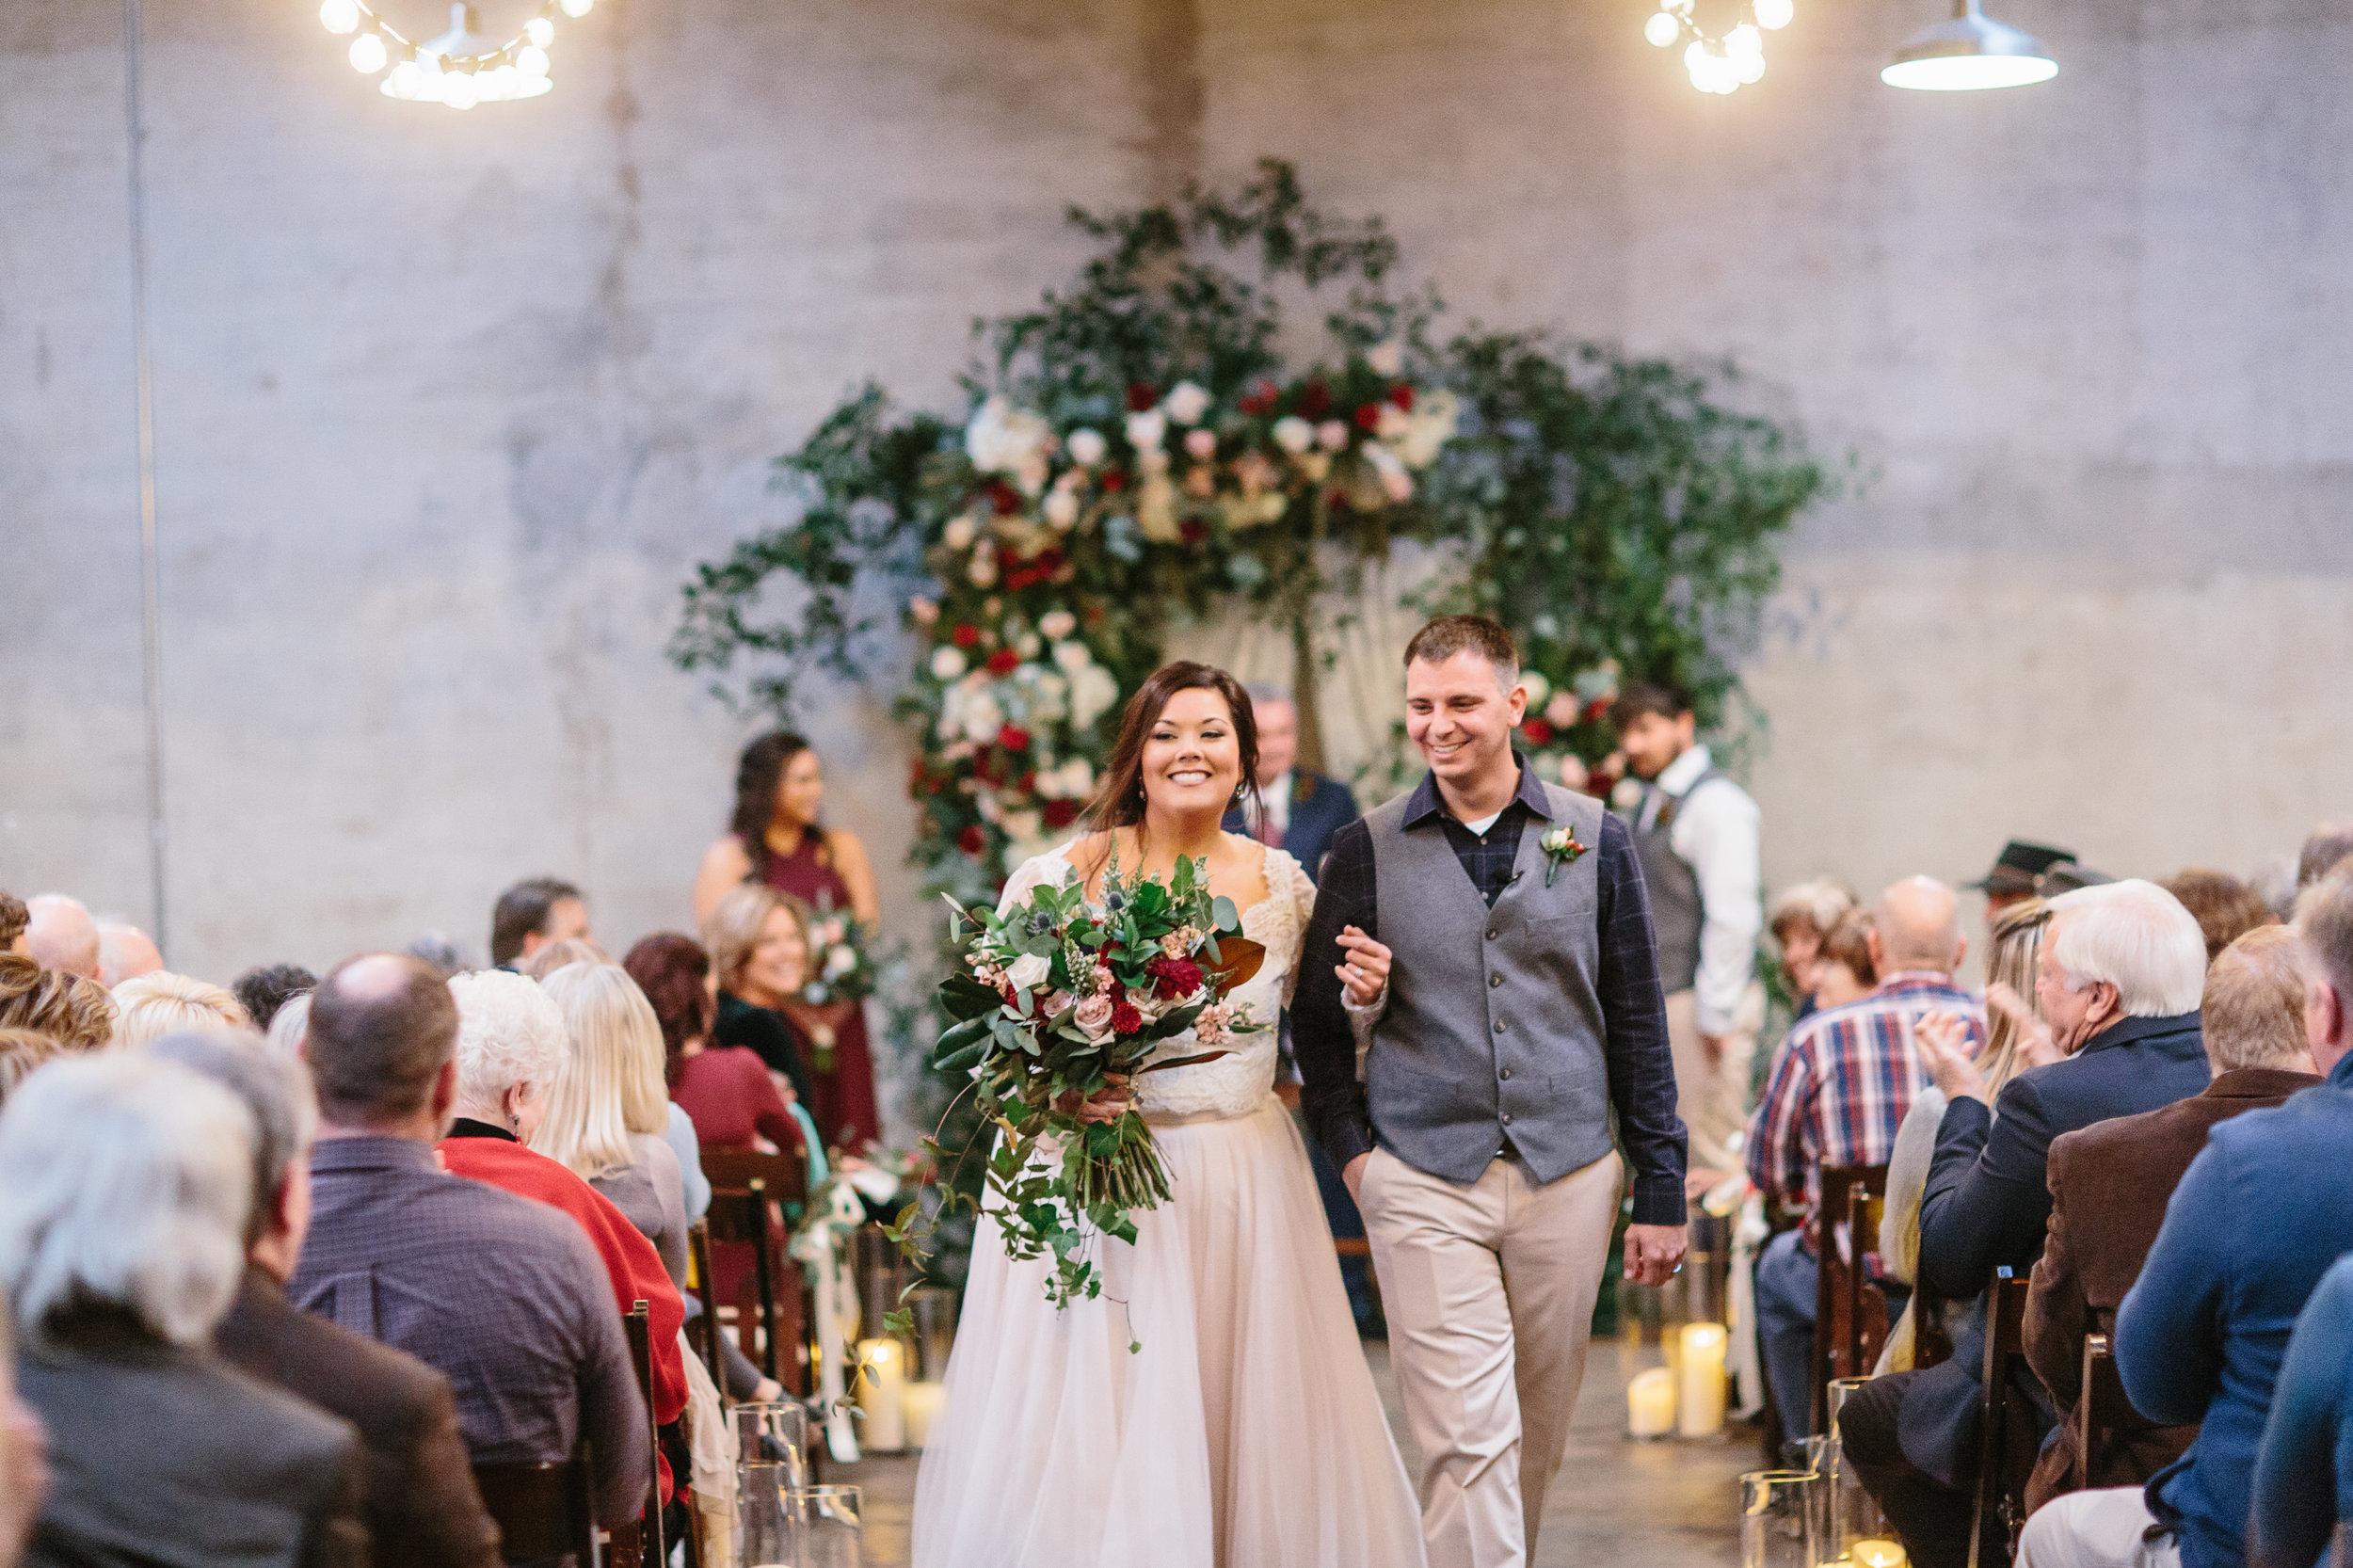 Lauren_Jeremy_Standard_Wedding_Knoxville_Abigail_Malone_Photography_FIlm-497.jpg